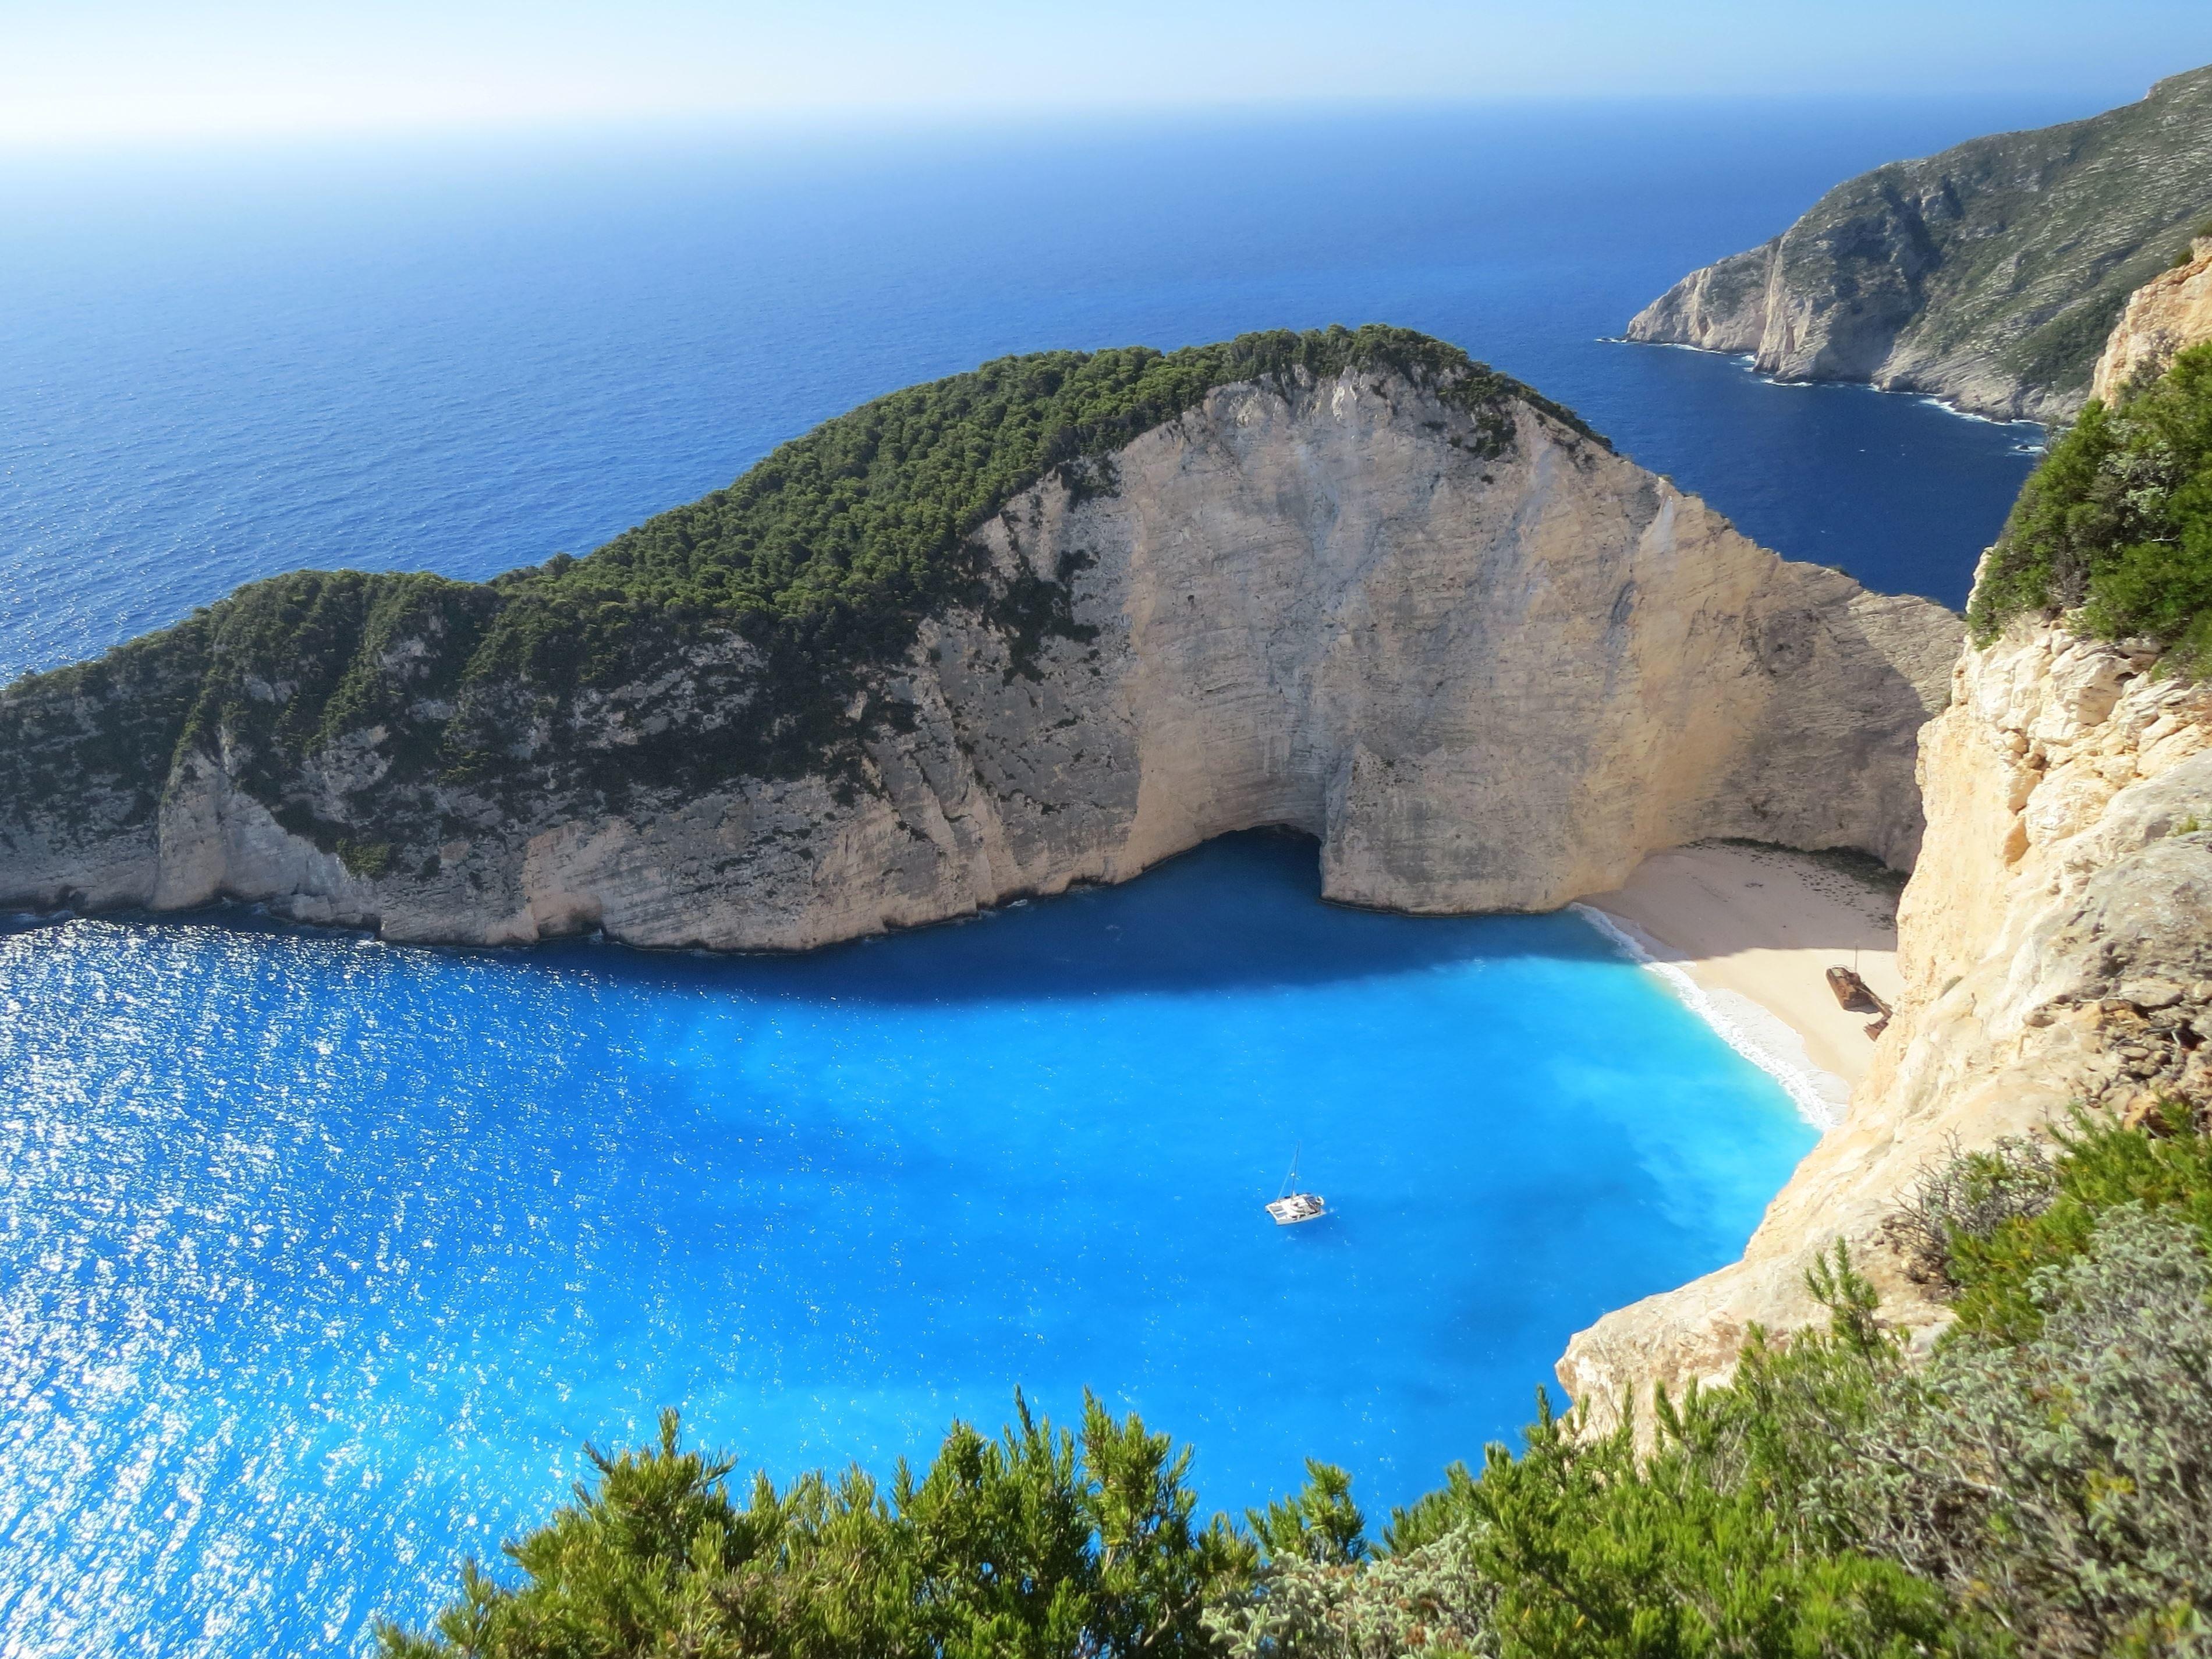 Imagen gratis mar orilla agua cielo playa costa for Fotos fondo de escritorio gratis